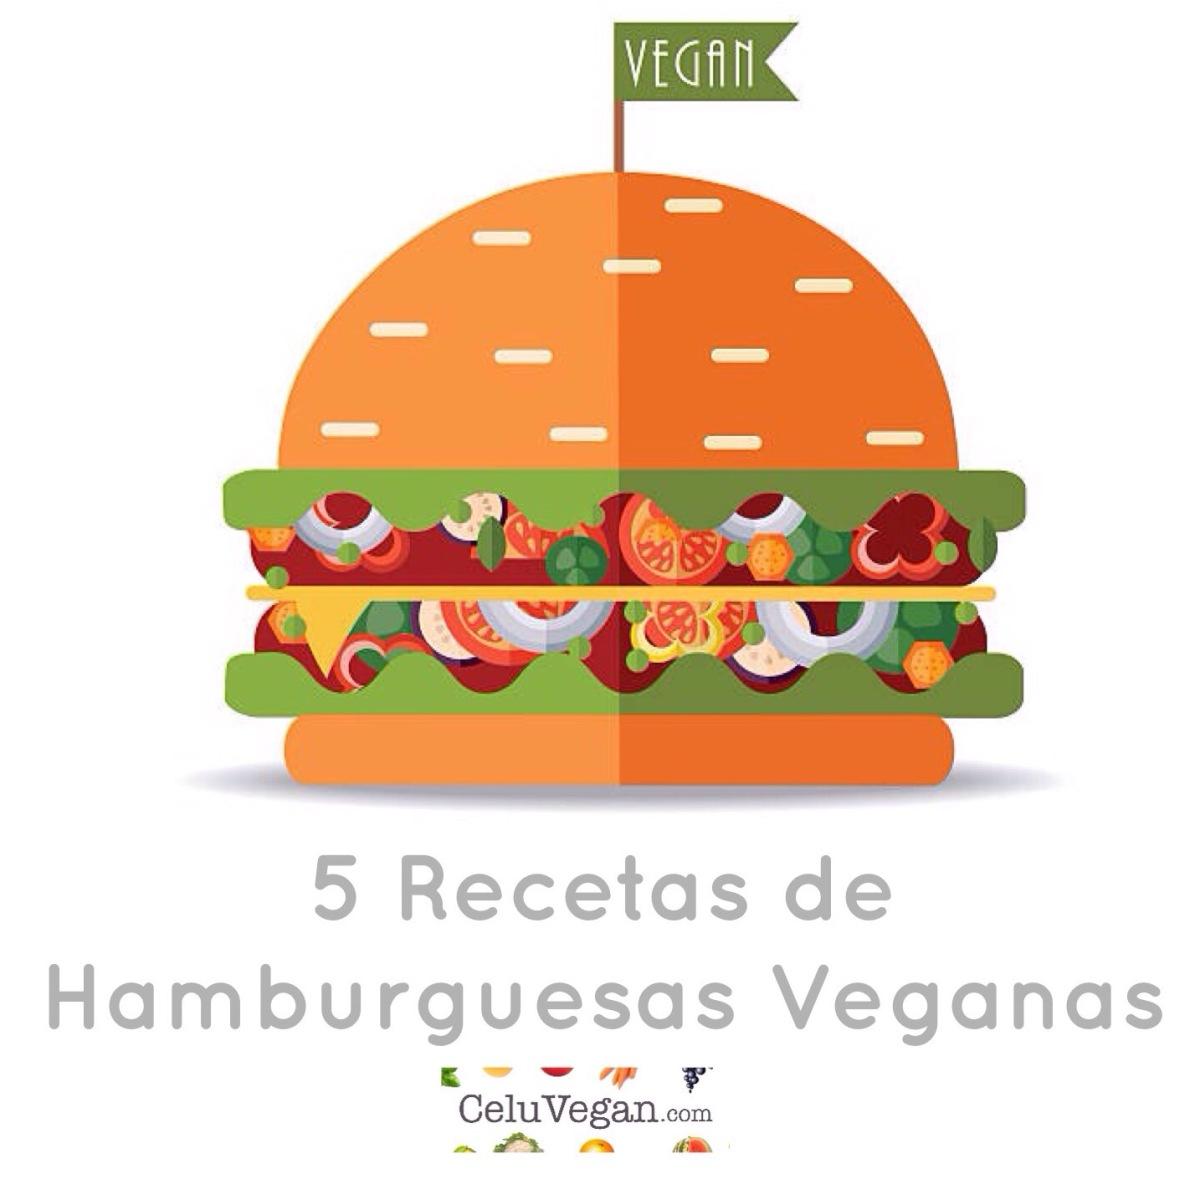 5 Recetas de Hamburguesas Veganas